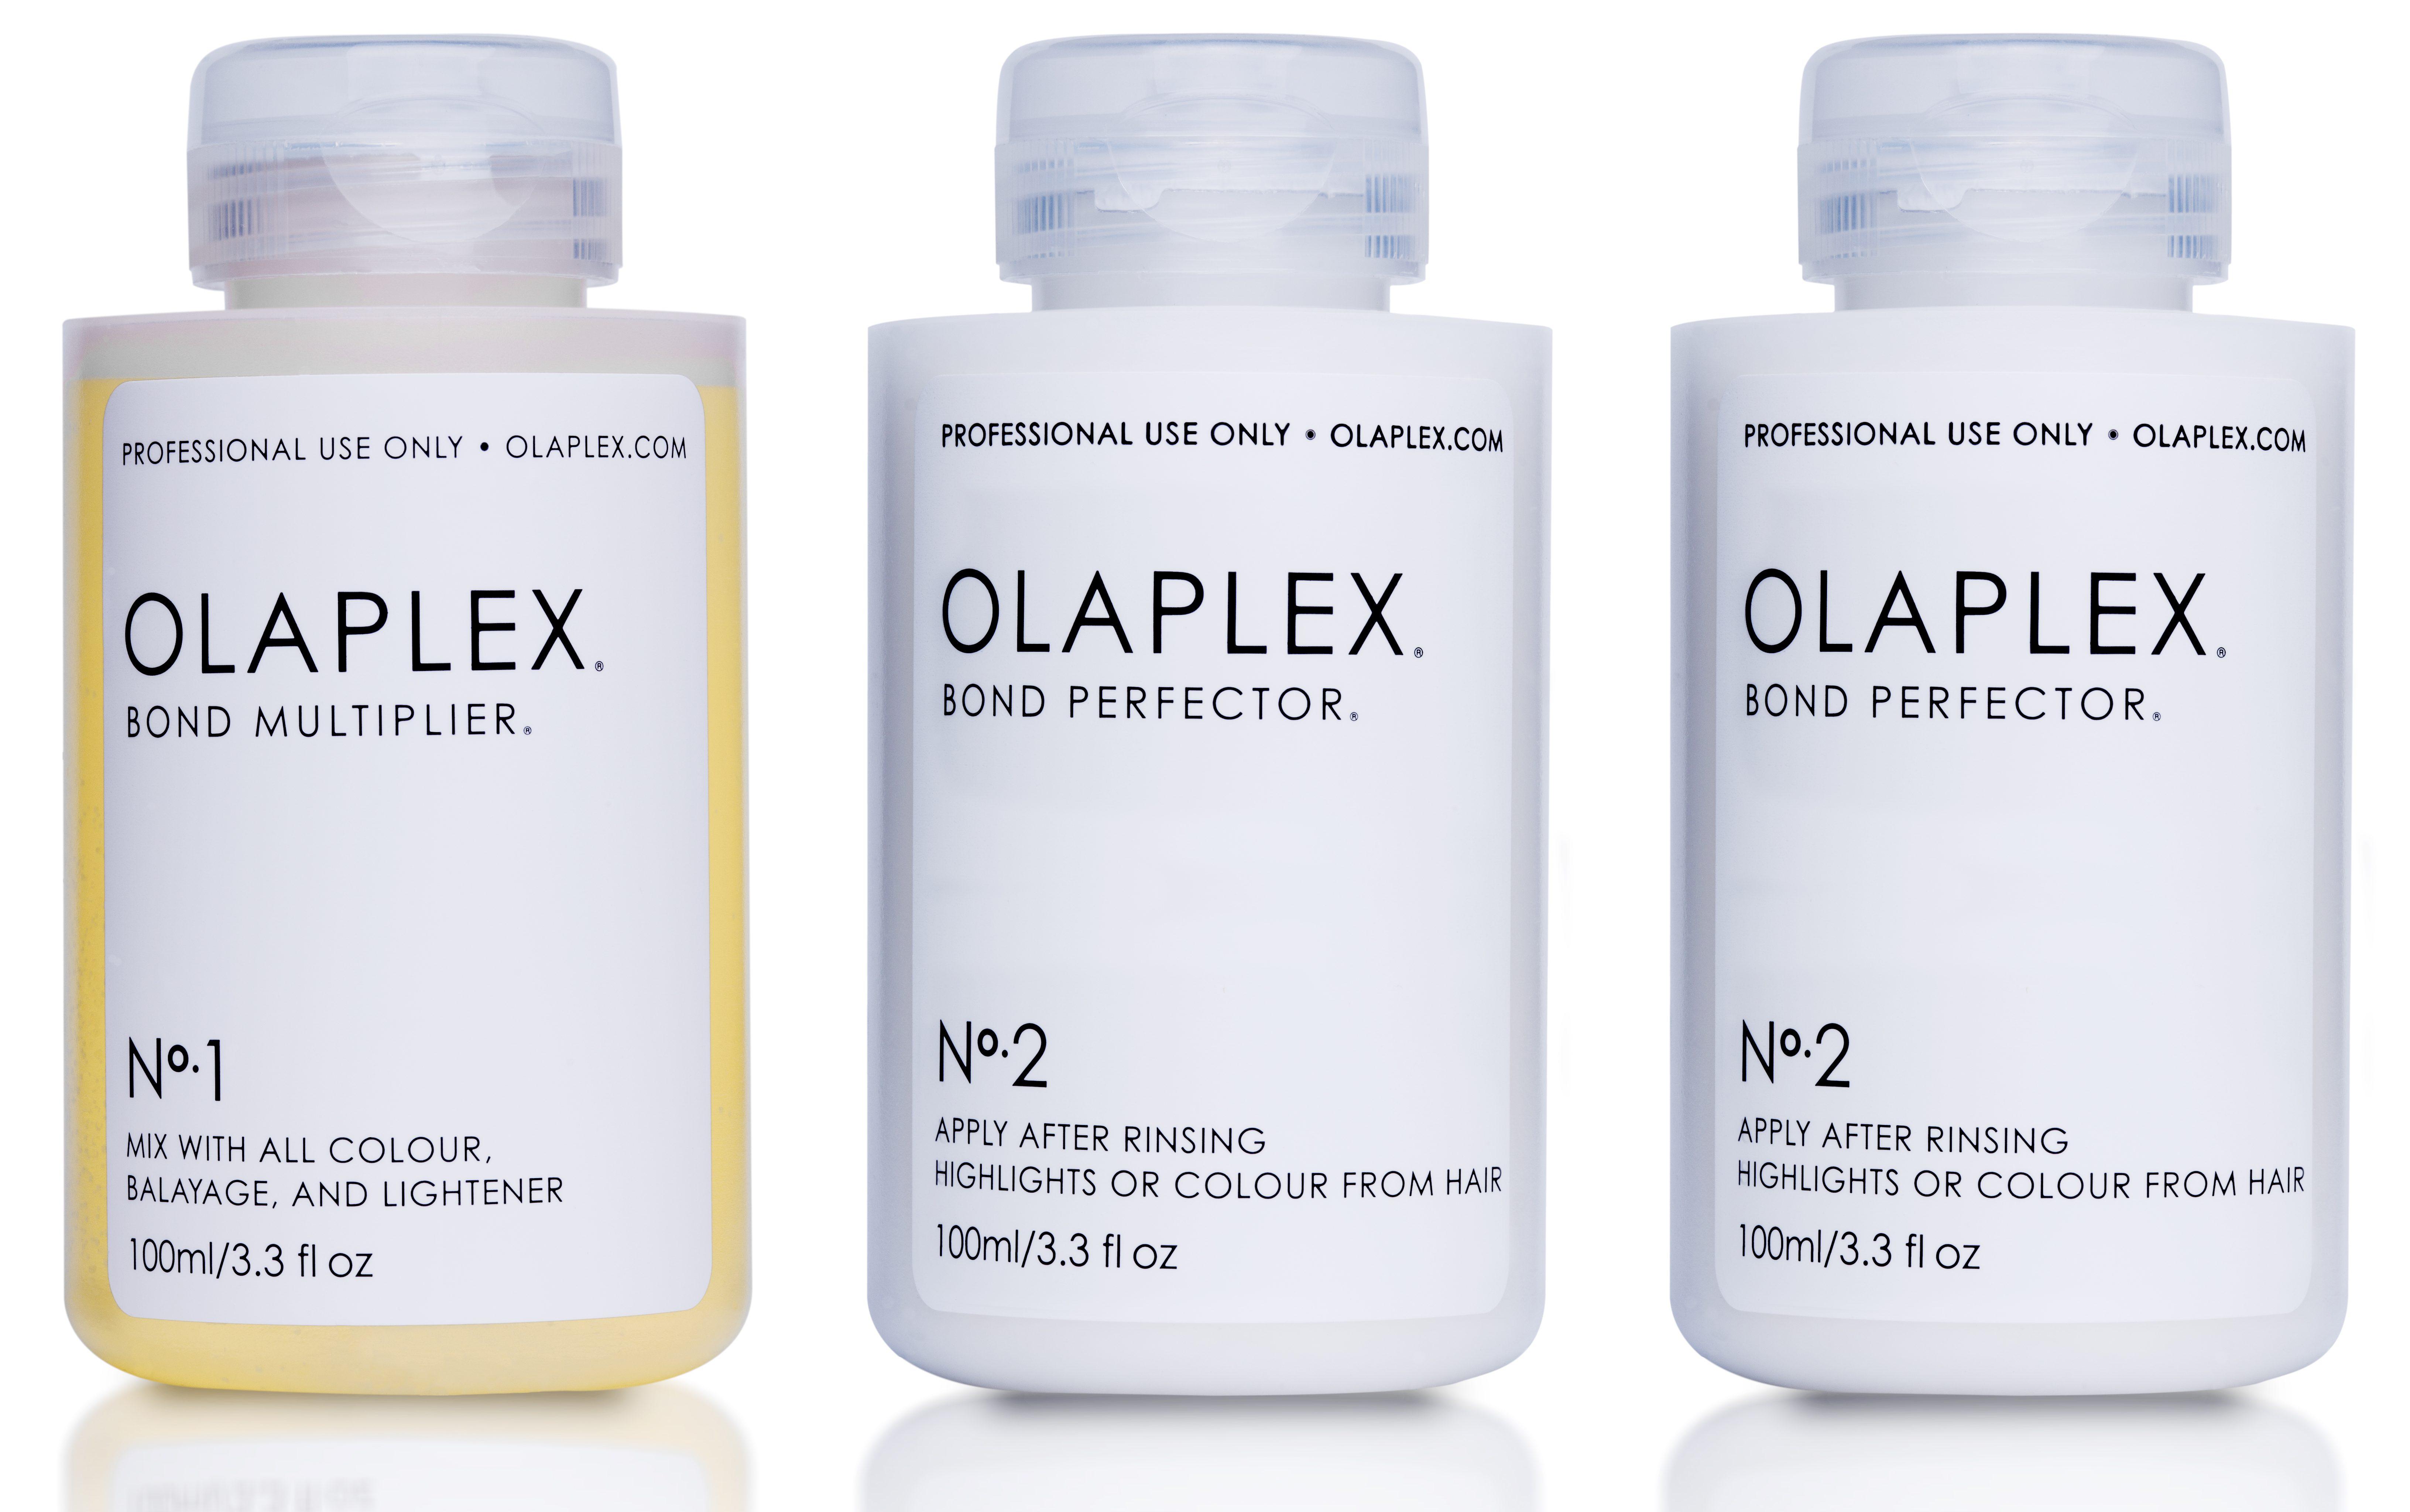 olaplex shampoo balsam hårprodukter